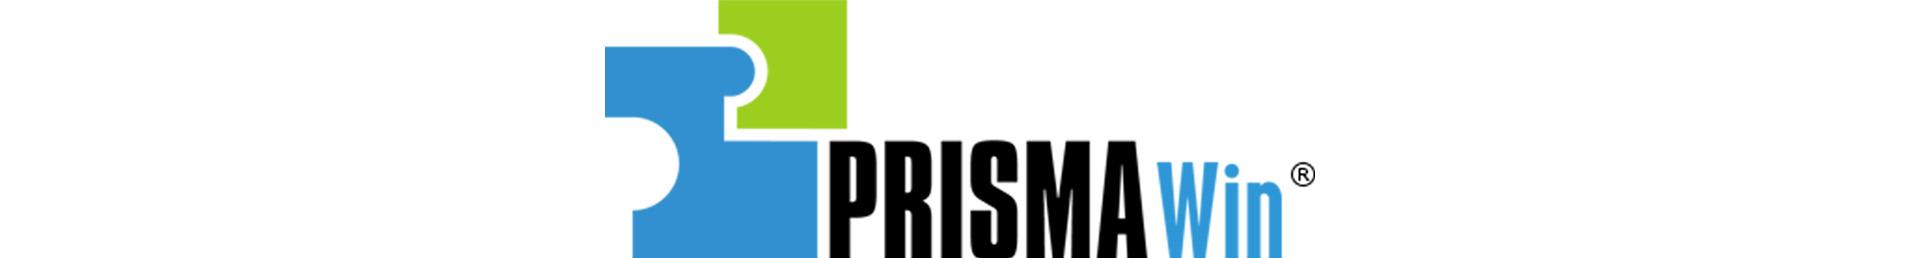 mihanografisi epihiriseon prisma win